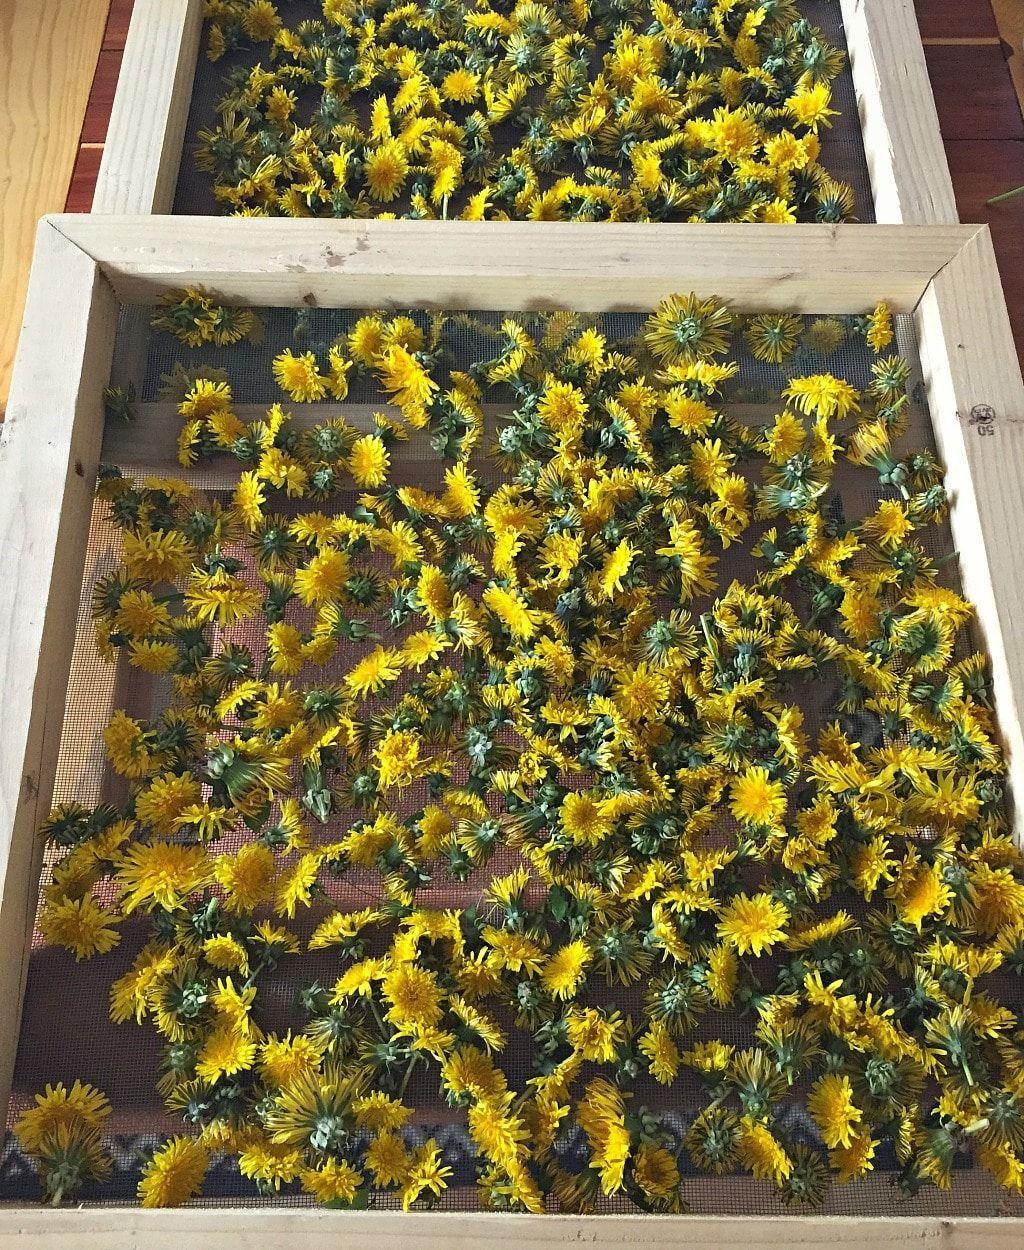 Dandelion Salve Recipe Herbalism Medicinal Plants Herbal Salves